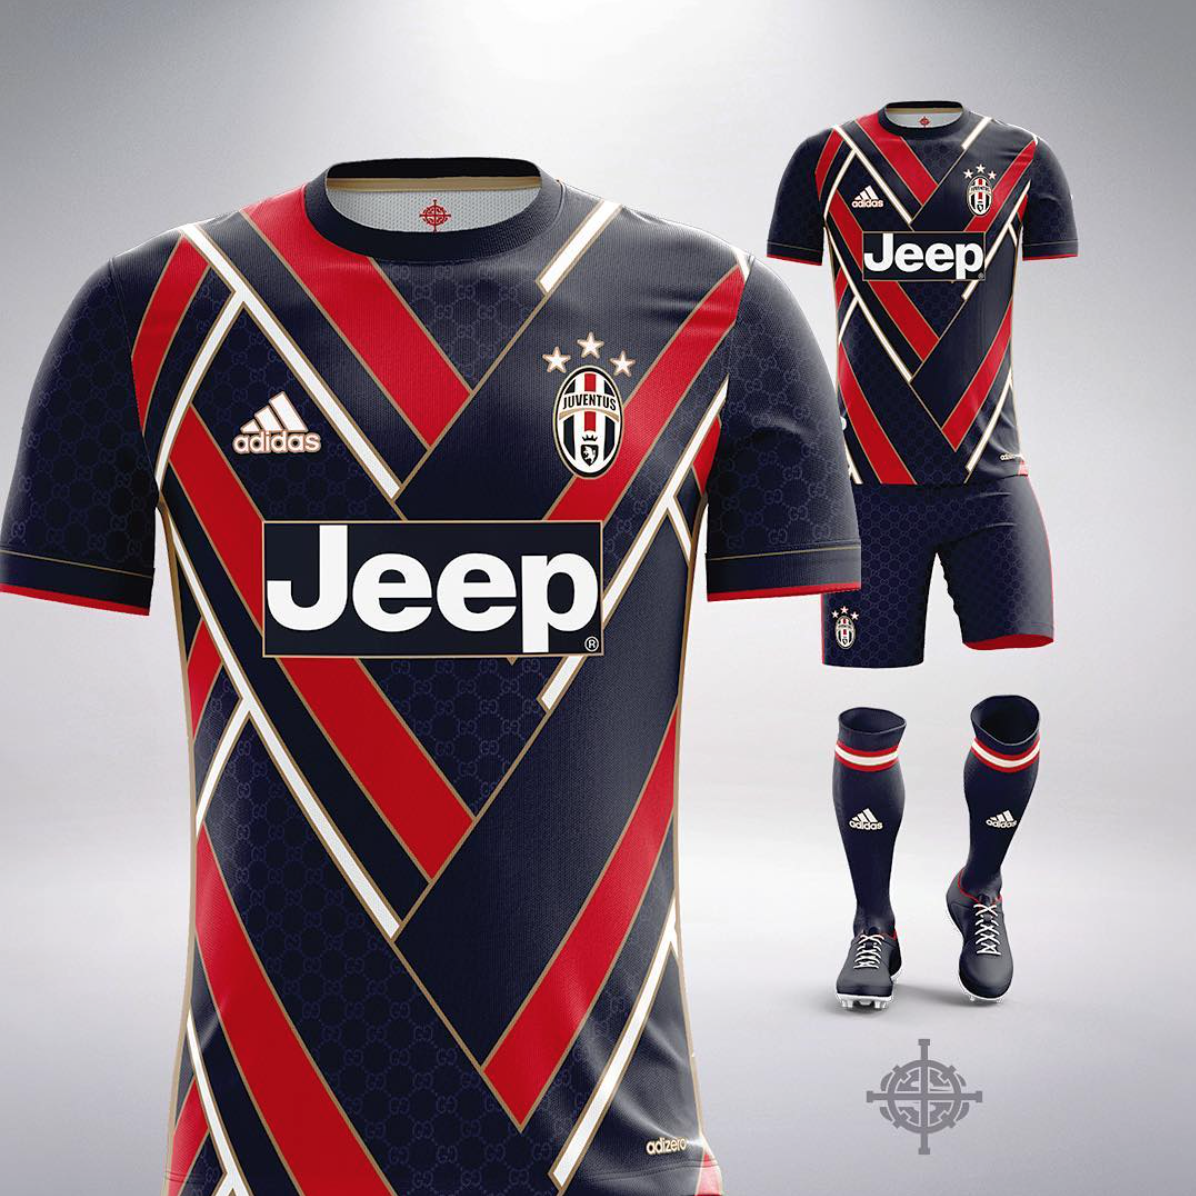 Football X Luxe By Marlon Settpace Juventus X Gucci 2 Randomness